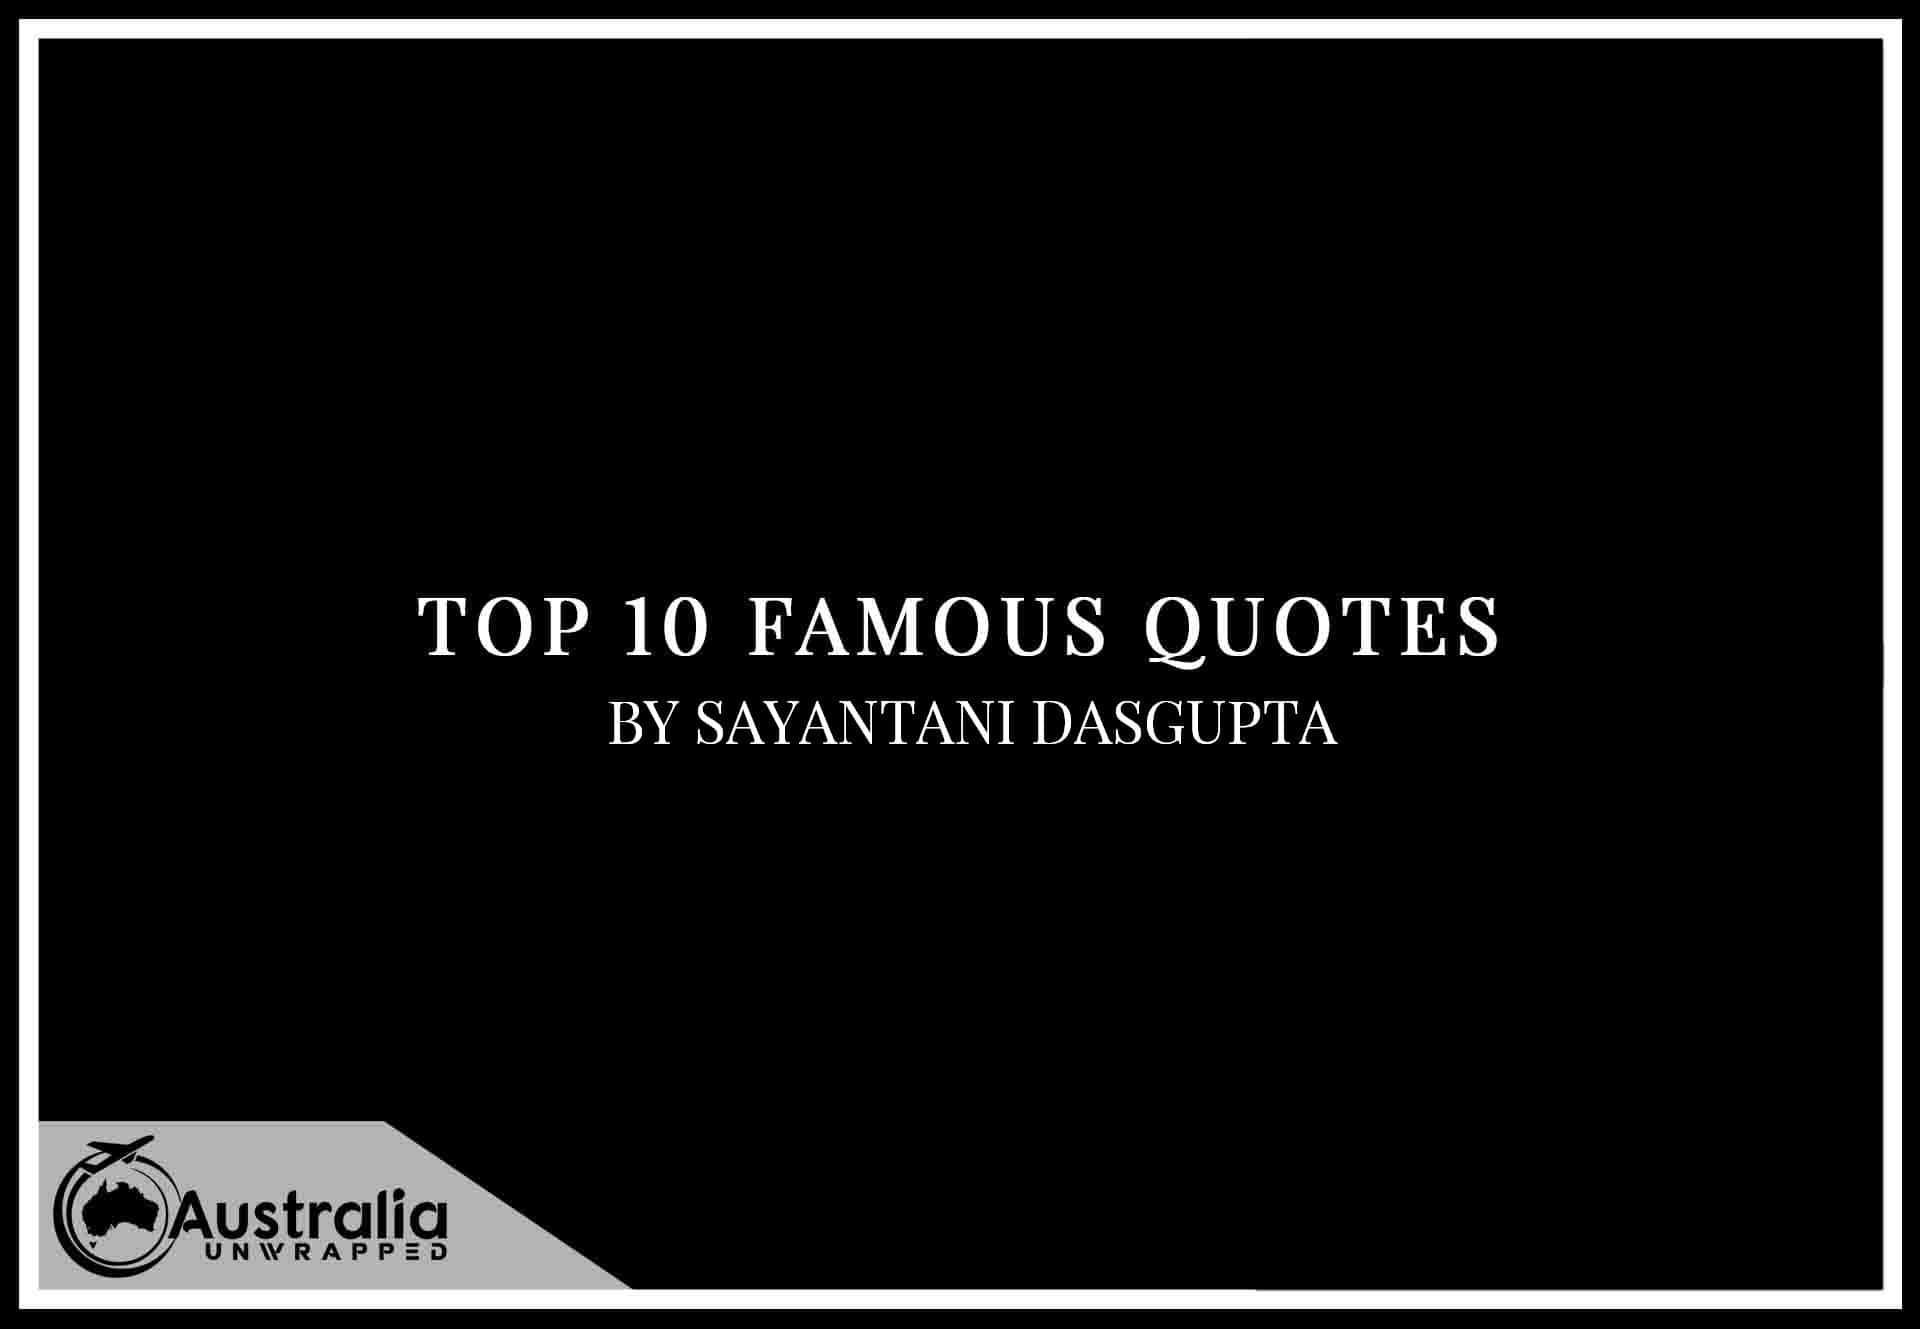 Top 10 Famous Quotes by Author Sayantani DasGupta